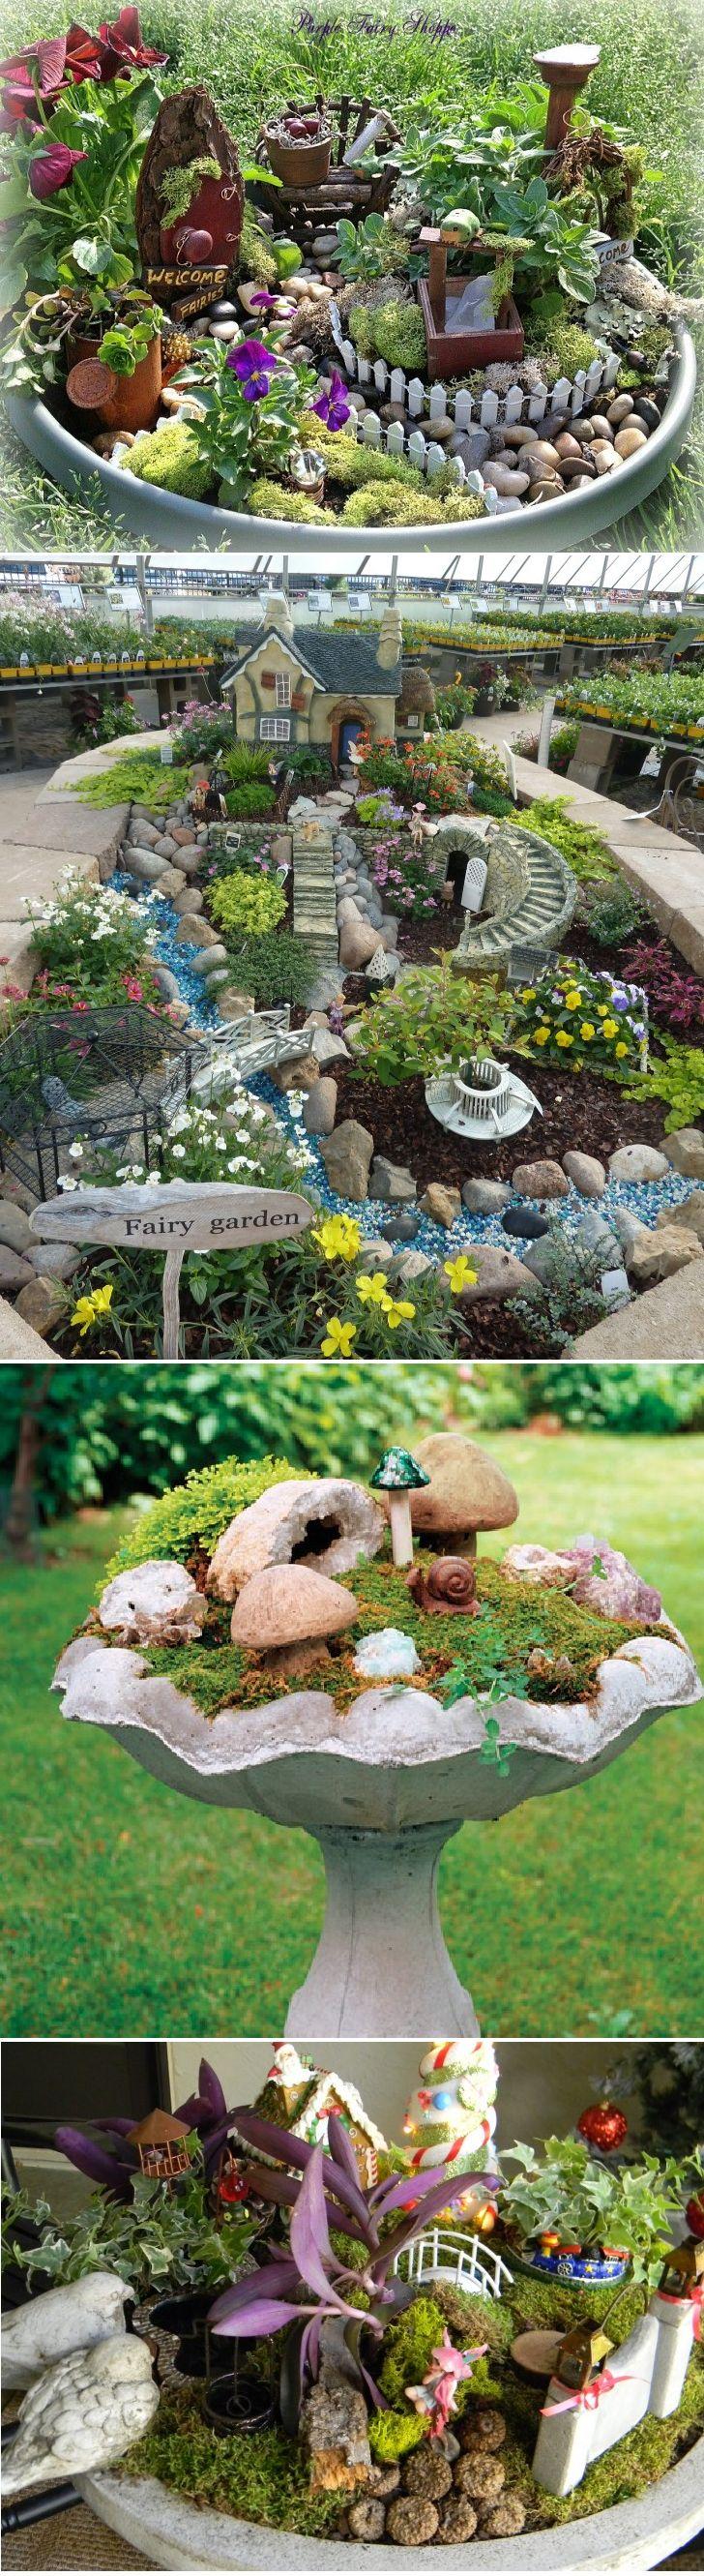 Diy ideas how to make fairy garden beautiful garden for Creating a beautiful garden